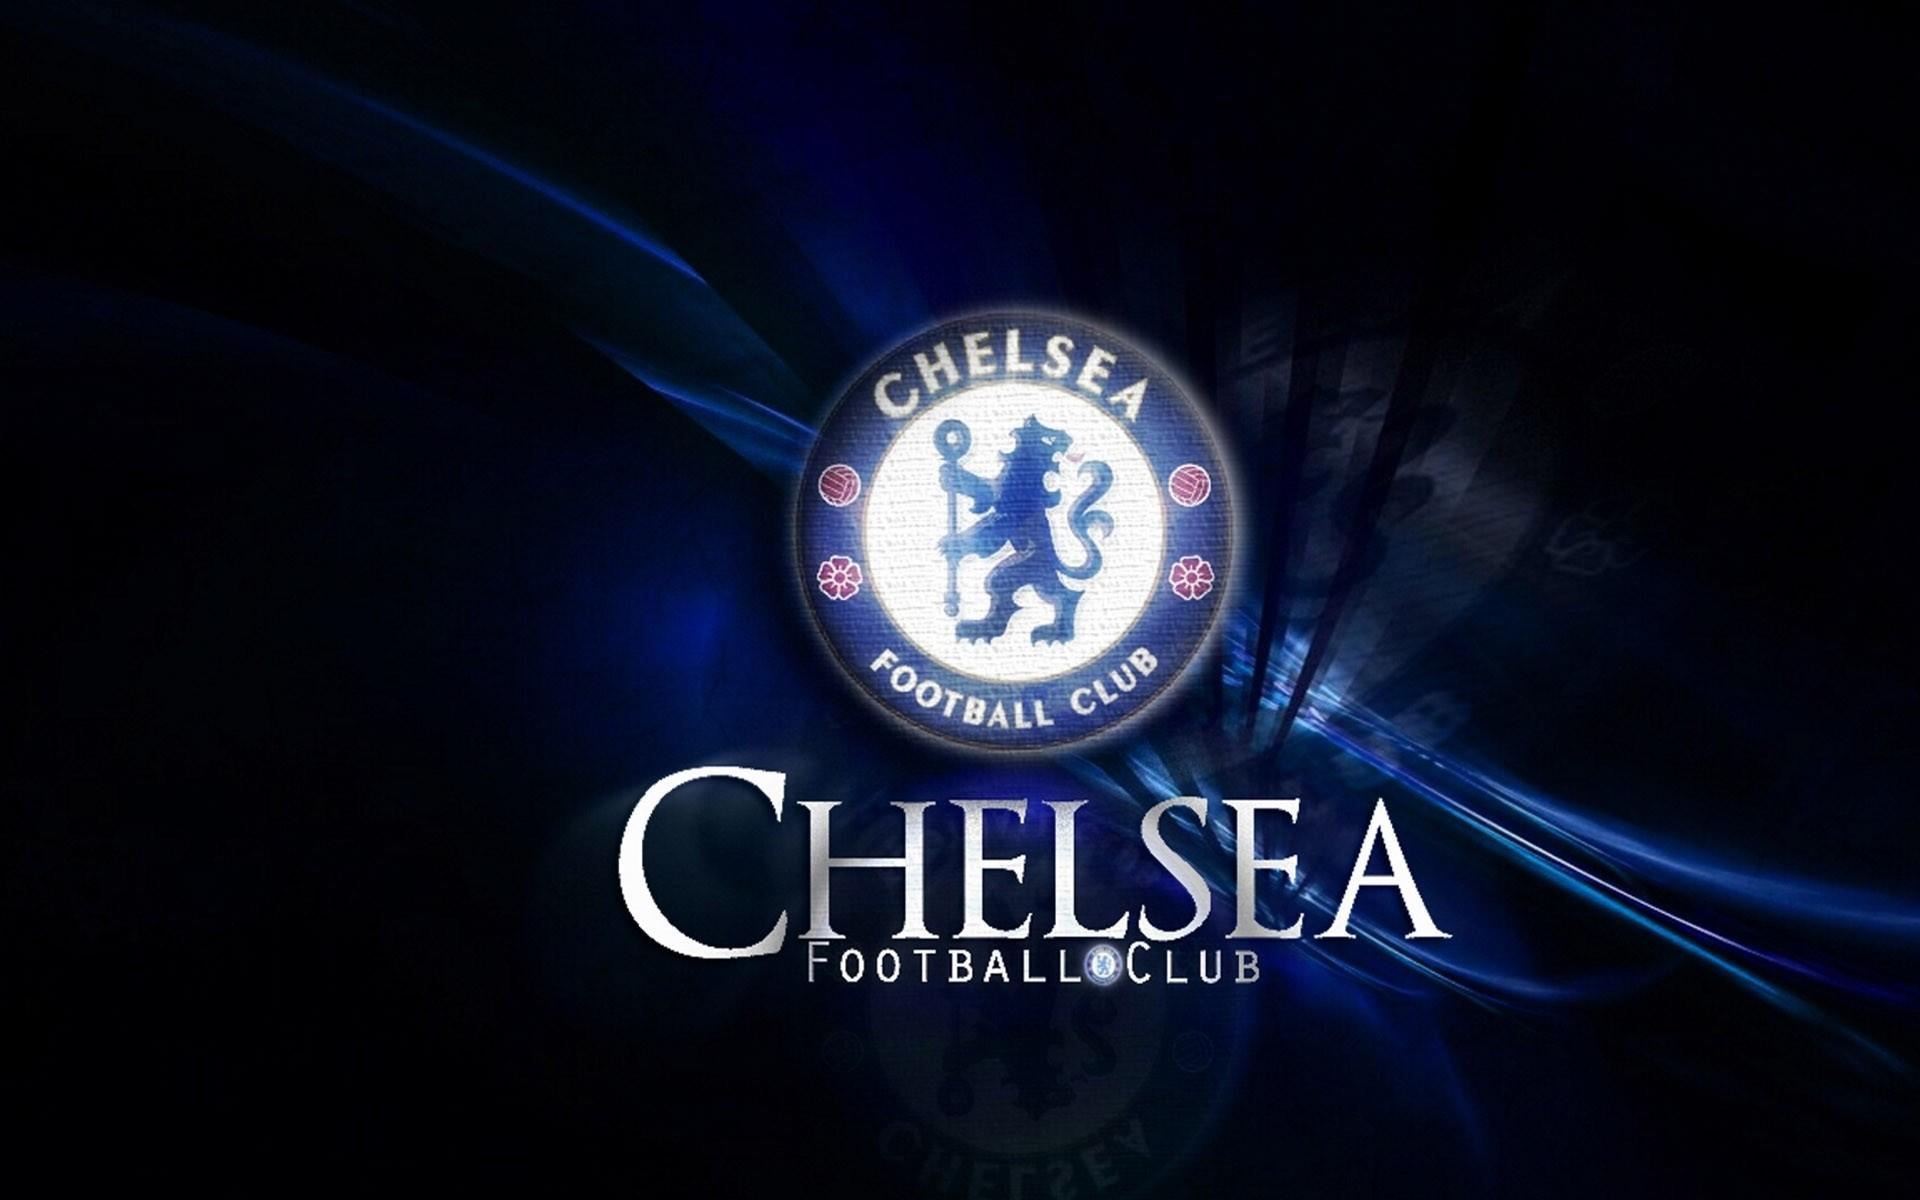 Chelsea Vs Man City: Chelsea Wallpaper 2018 HD (68+ Images